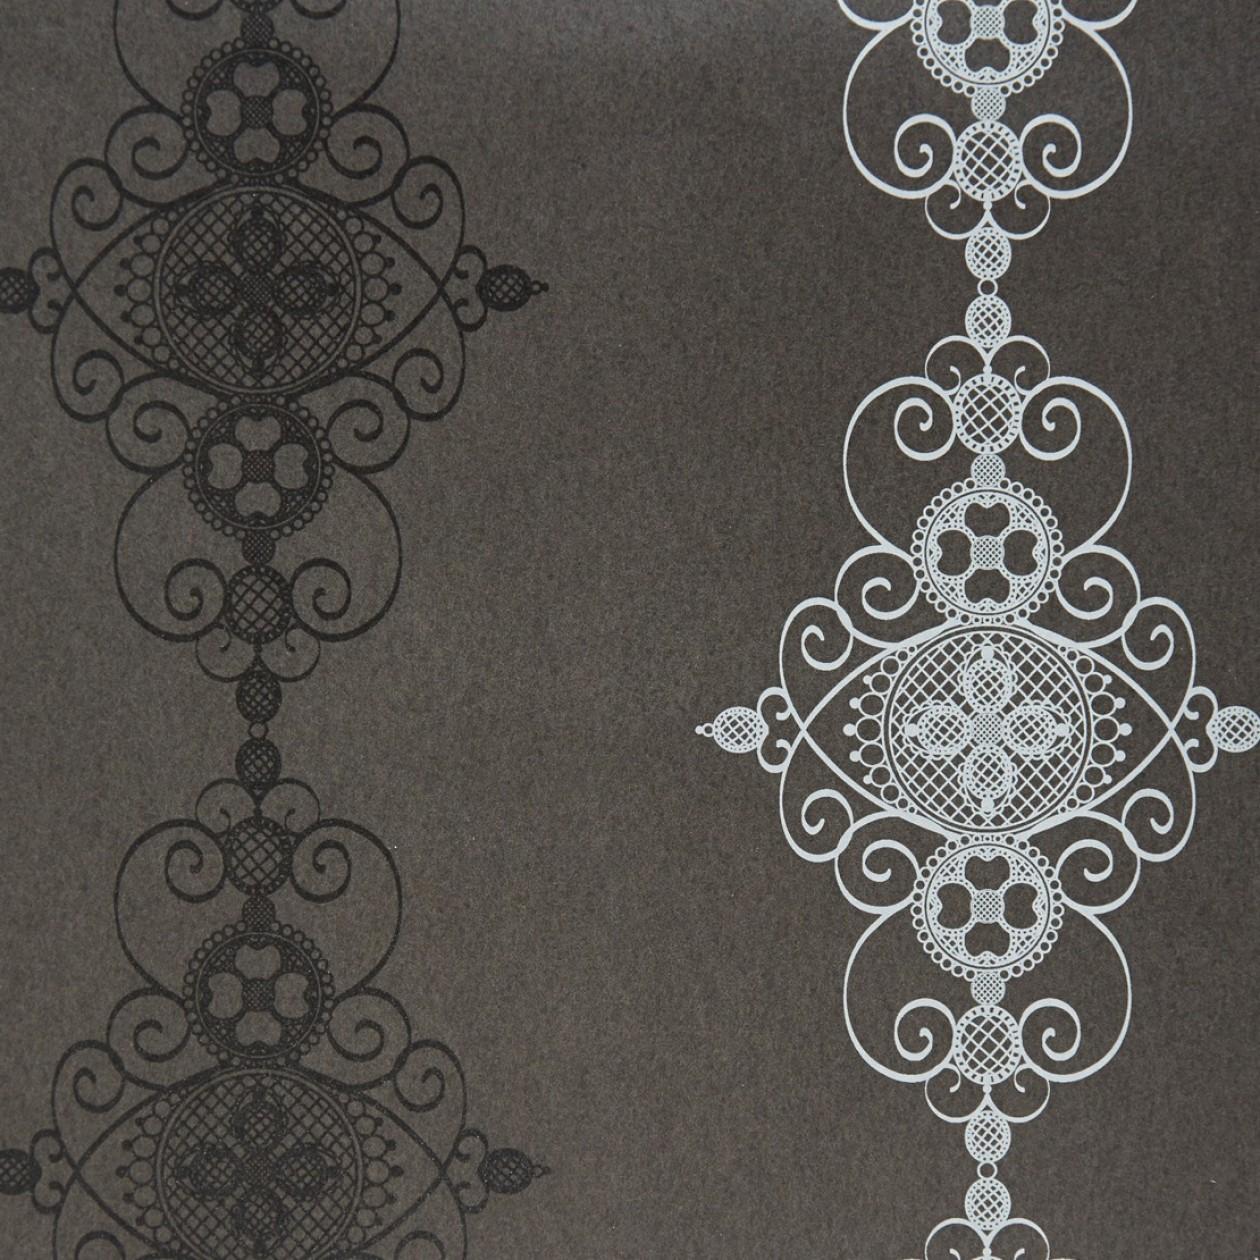 Французские обои Caselio,  коллекция Lady, артикулLDY6035-91-00